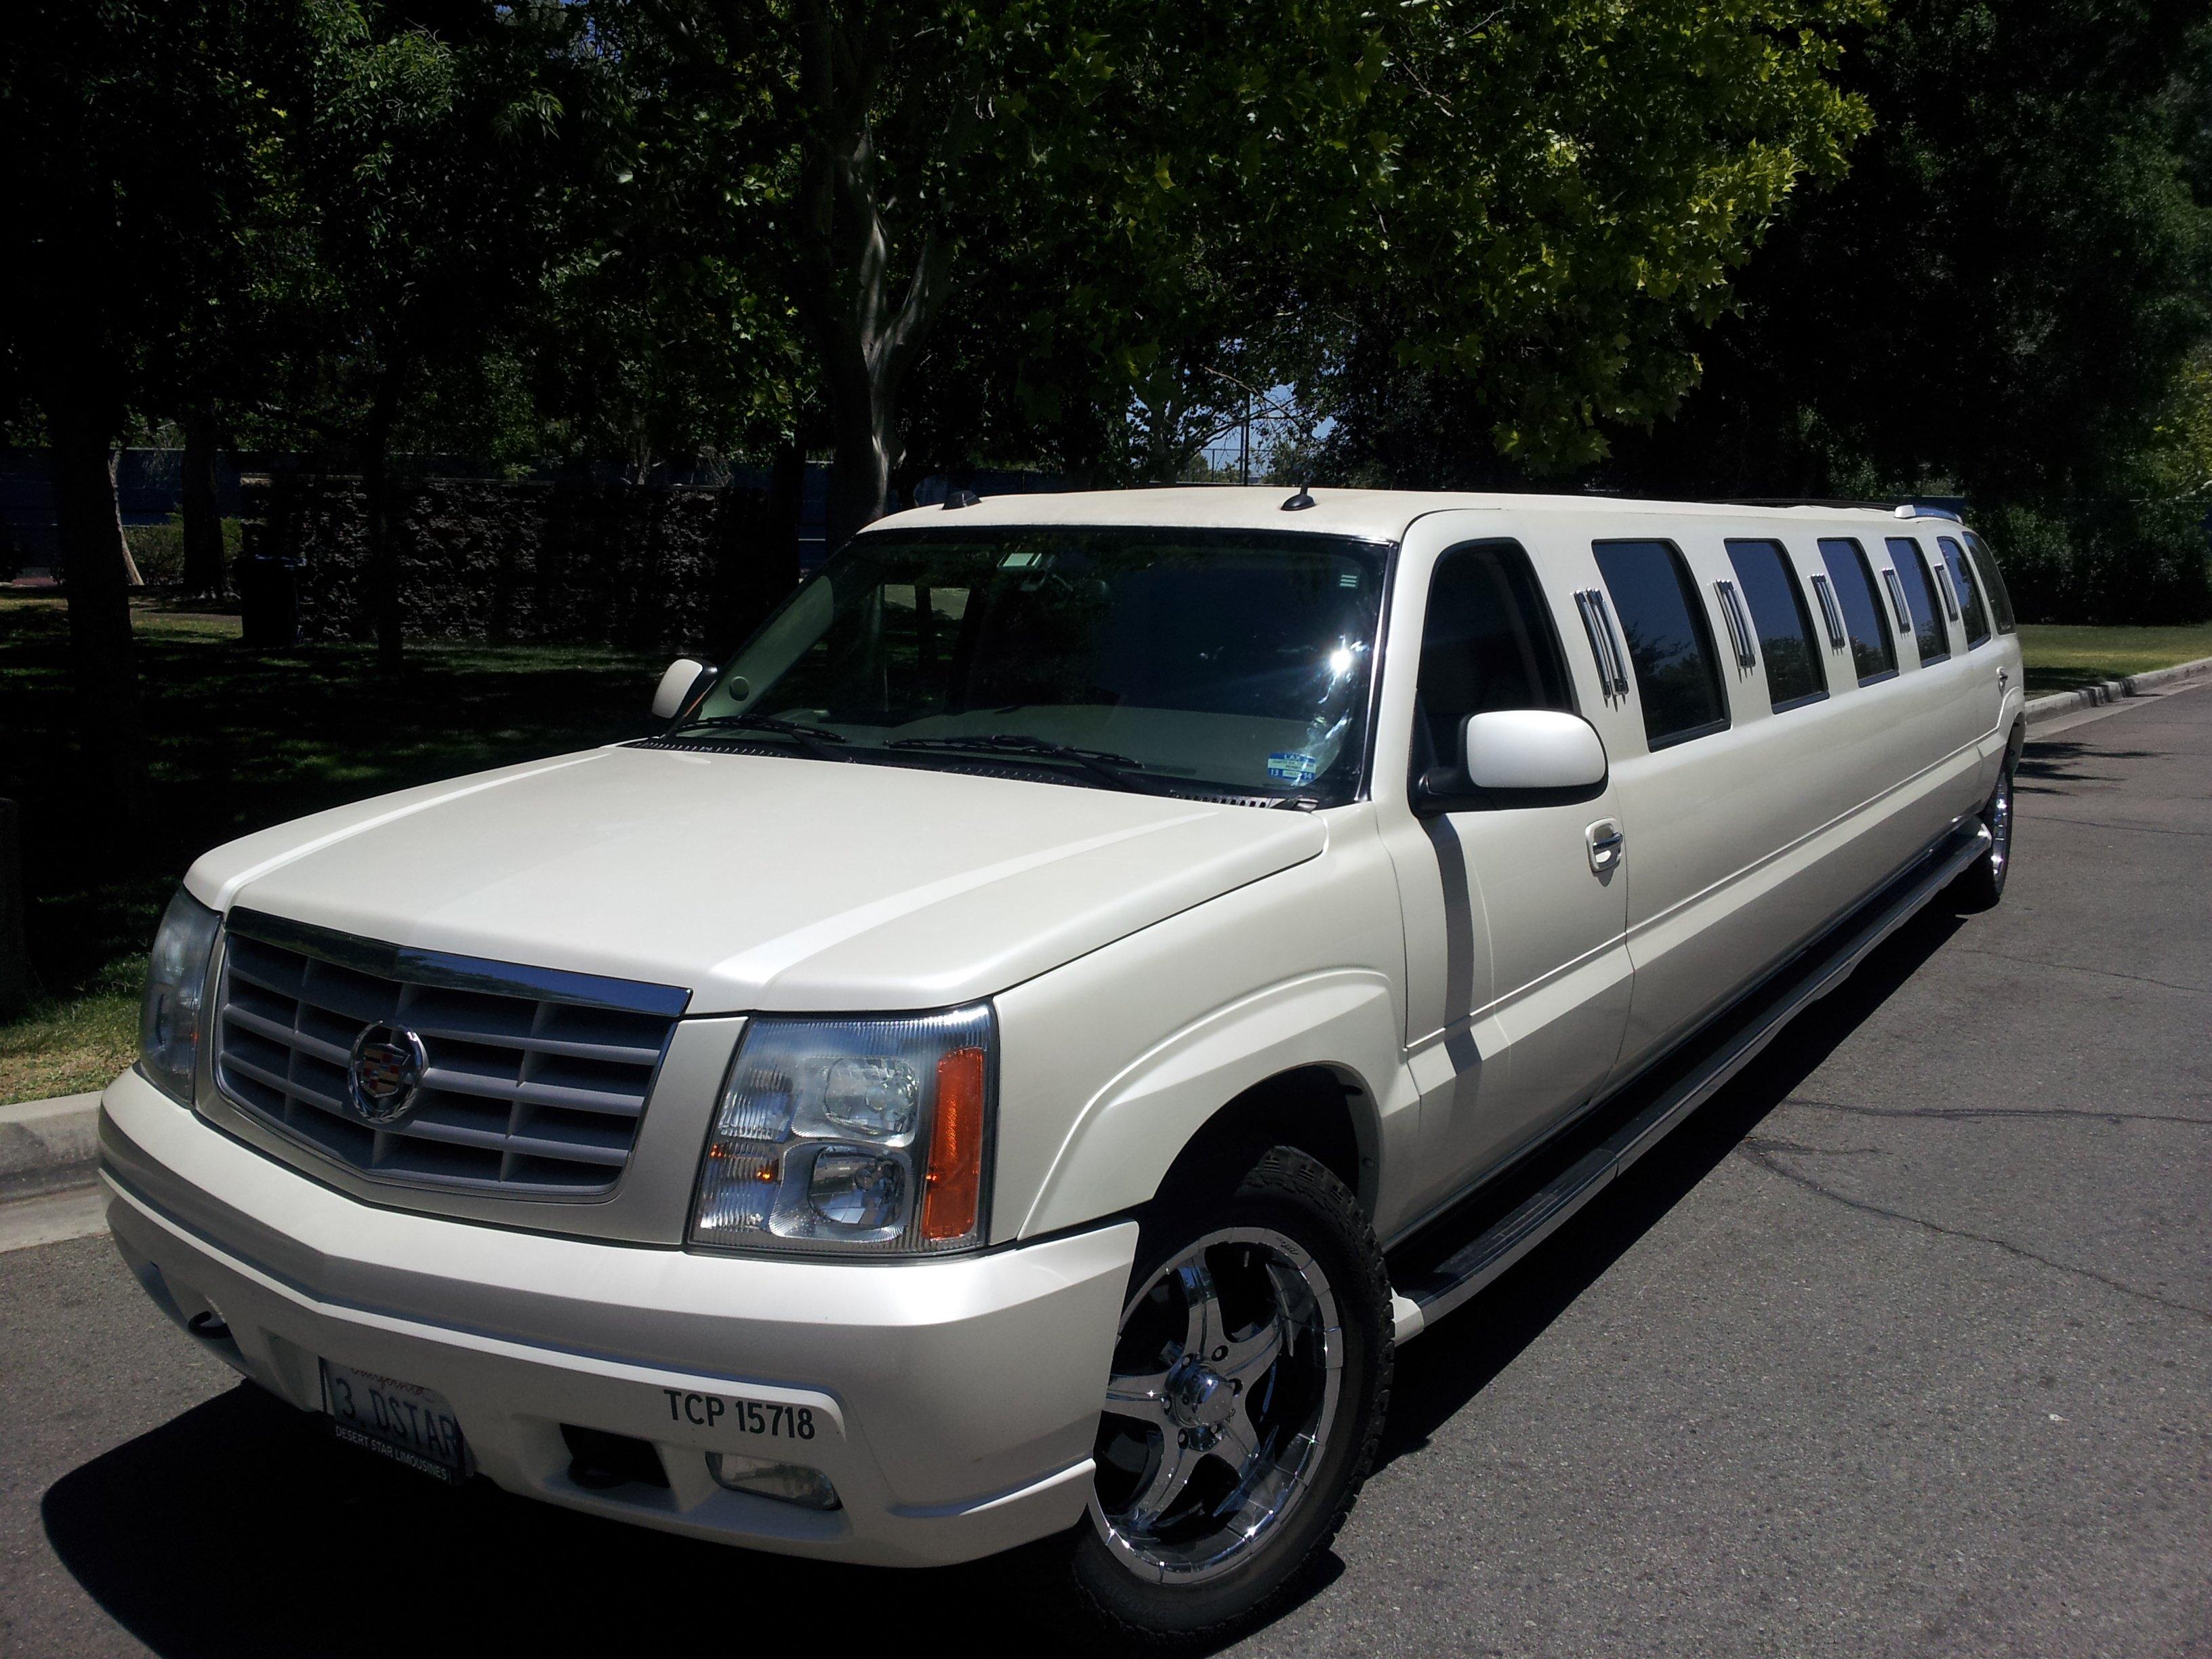 White Diamond Cadillac Escalade SUV Limousine | Desert ...